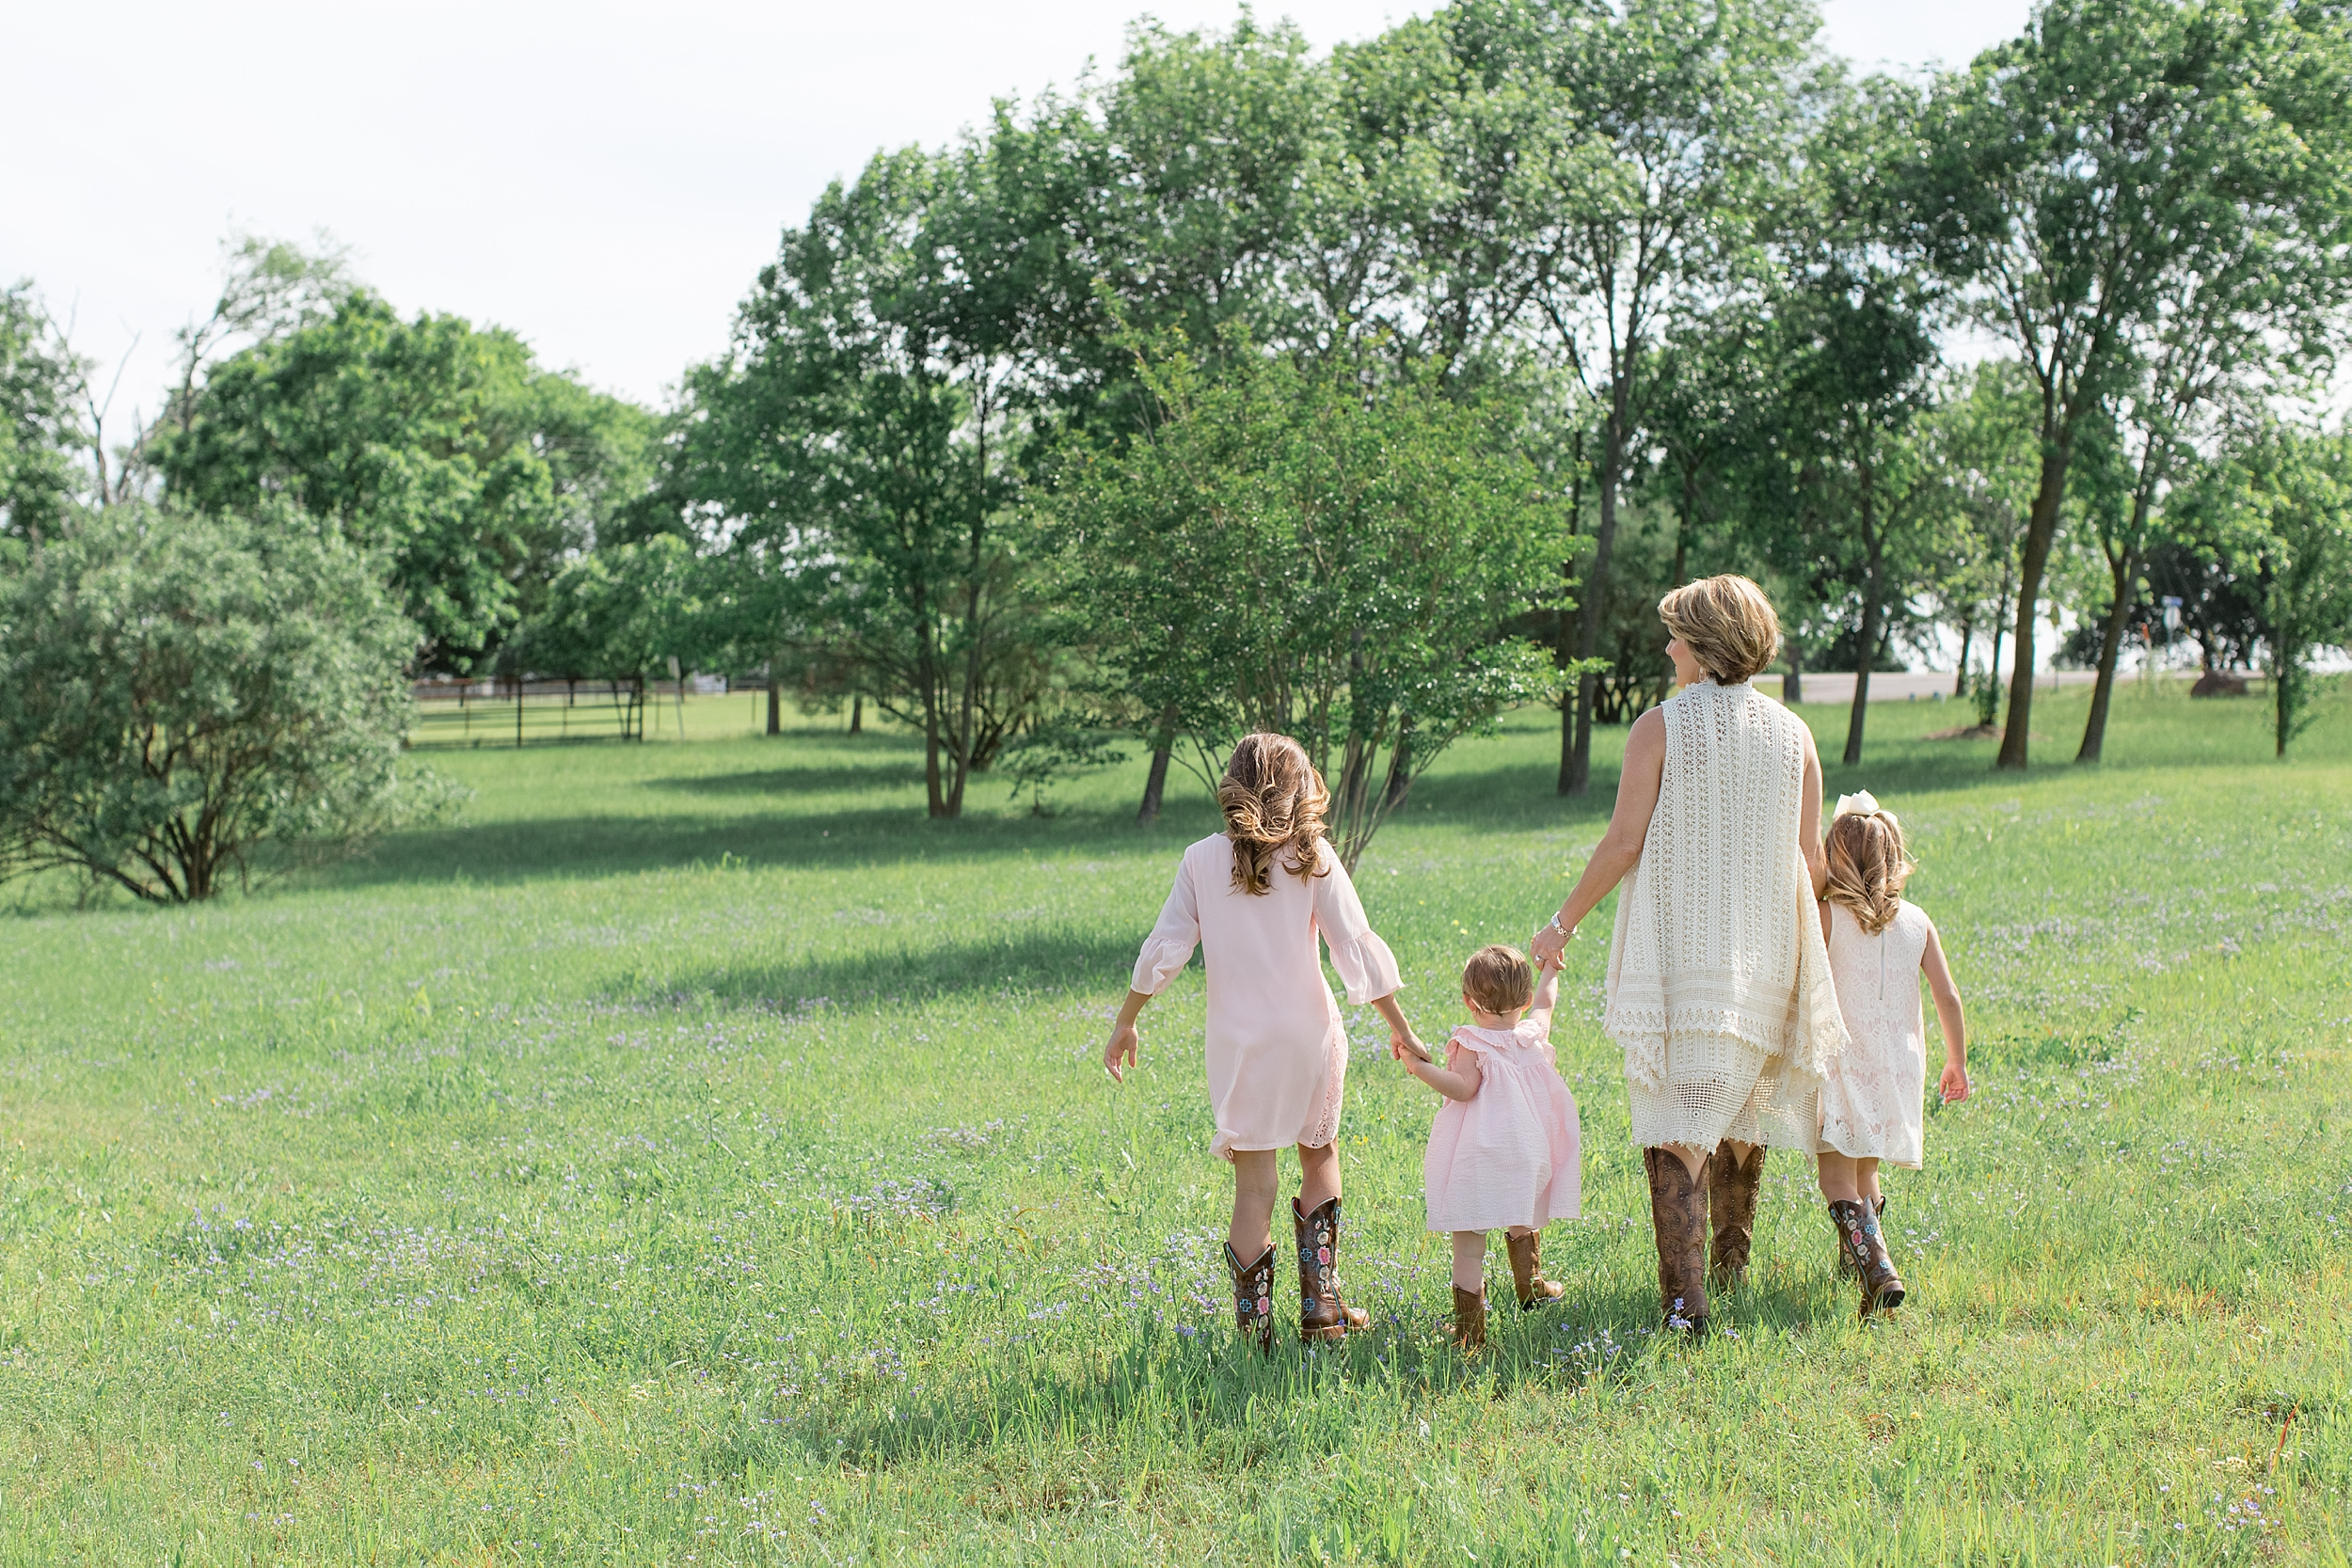 Landon-Schneider-Photography-Family-Session-Texas_0002.jpg